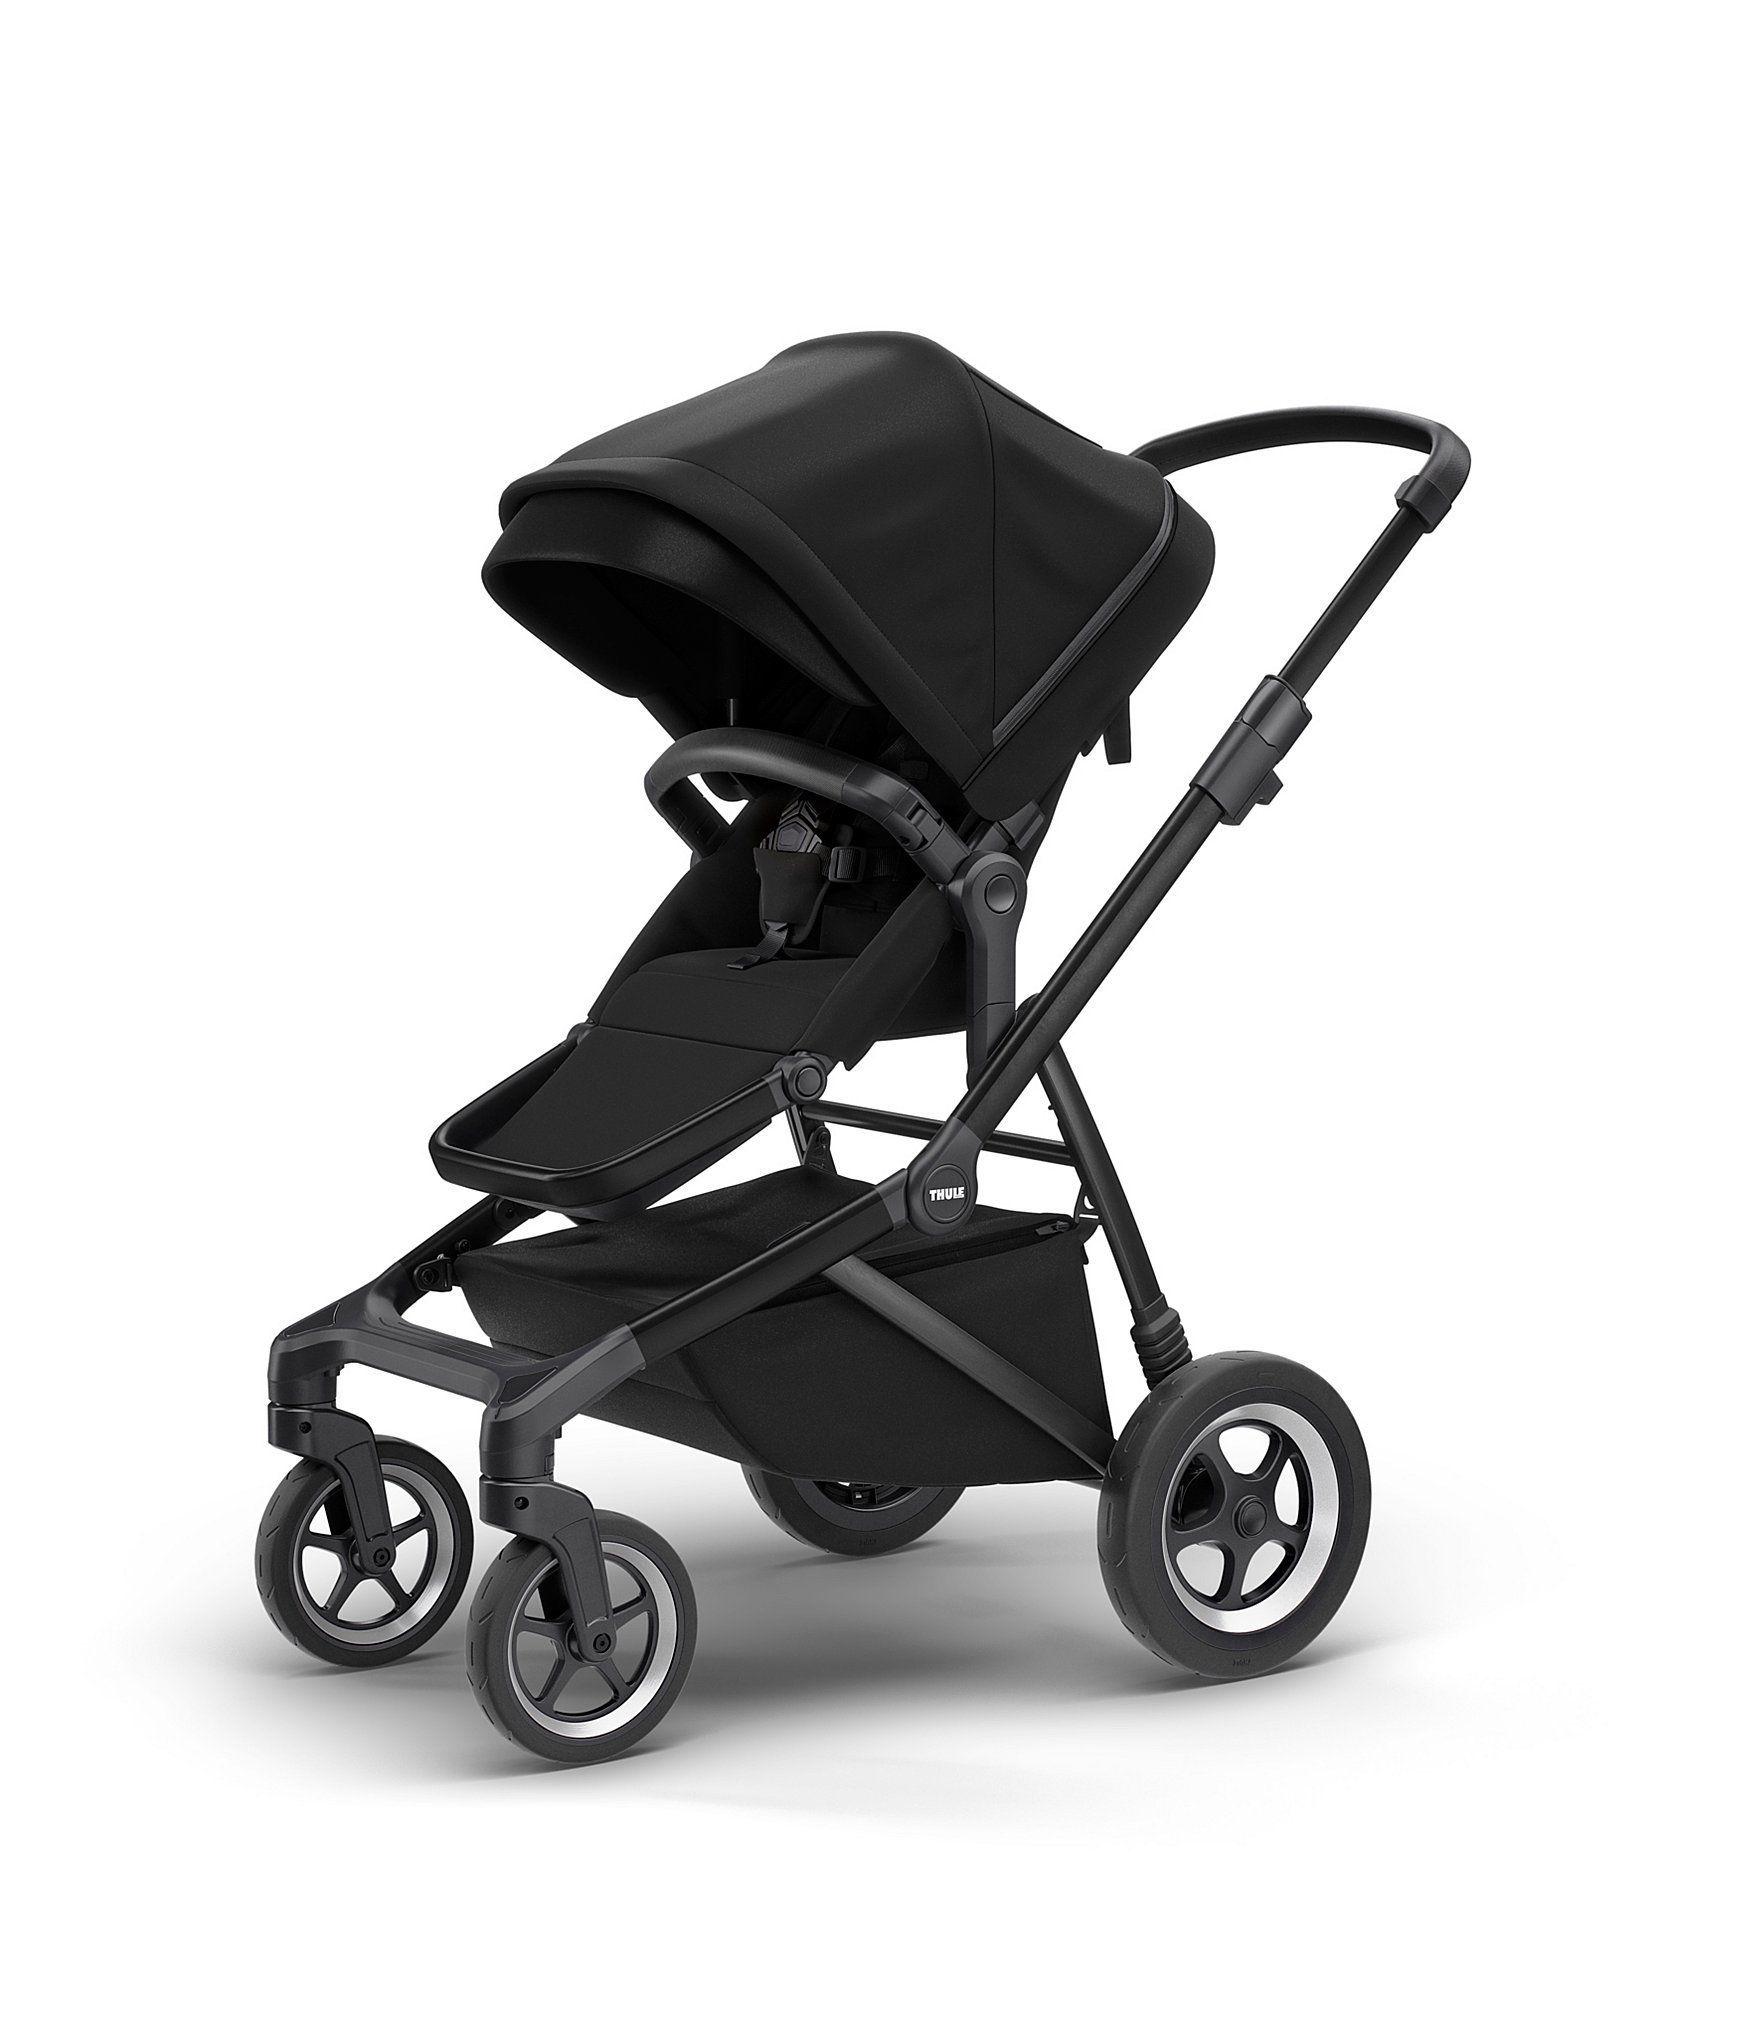 Thule Sleek City Stroller Black On Black N/A Discover